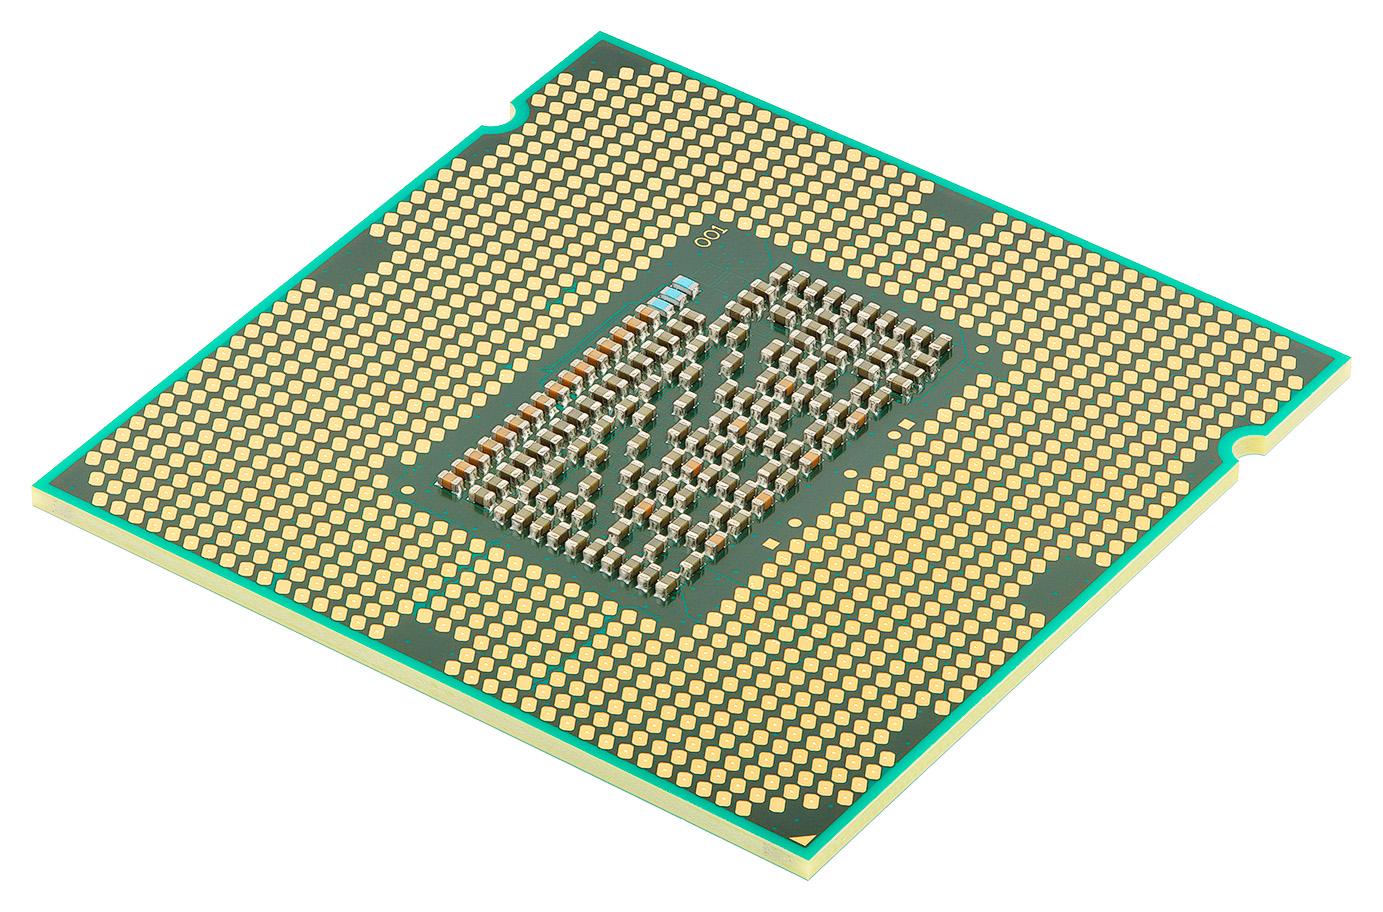 THG Tuning Teszt: Core 2 Extreme vs. Athlon 64 FX-62